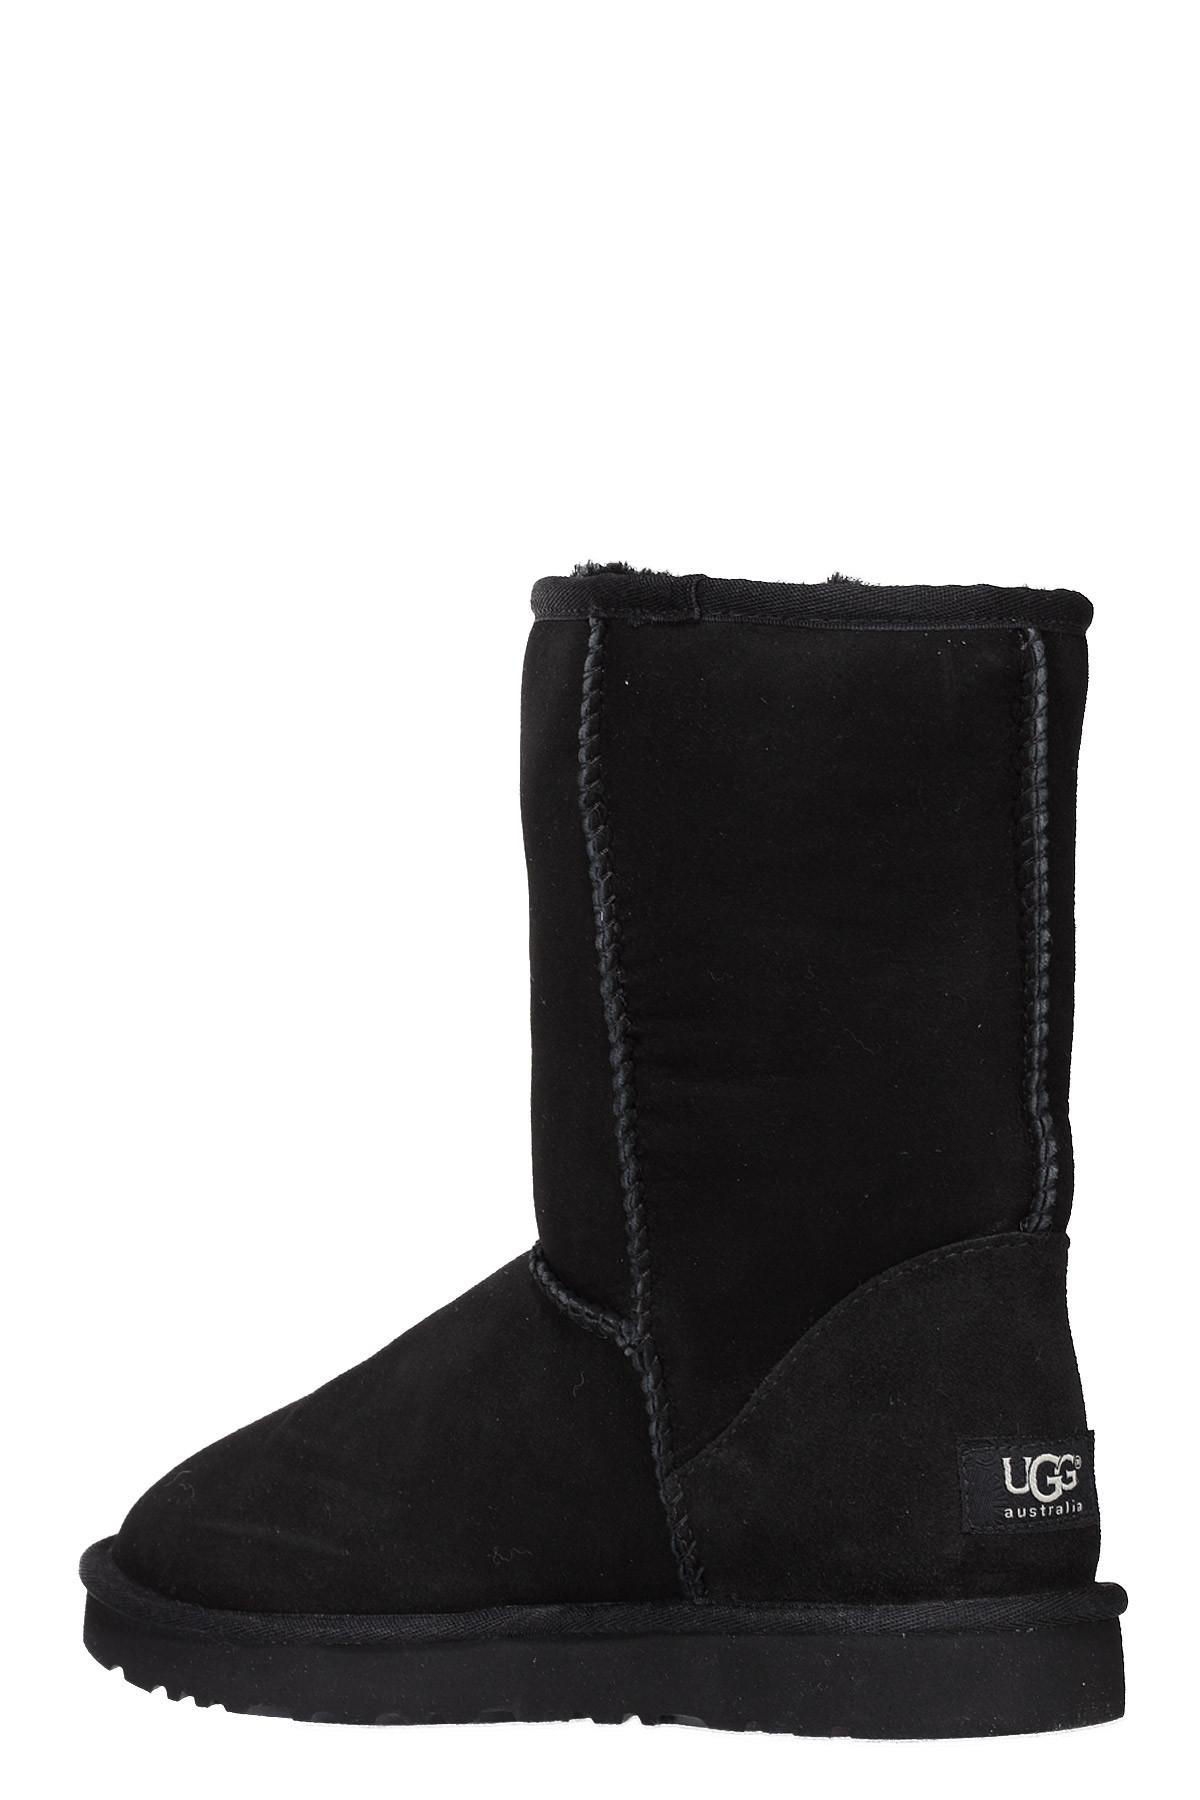 W Boots Ugg ShortBottines Et Classic Cuff Yfgy7b6